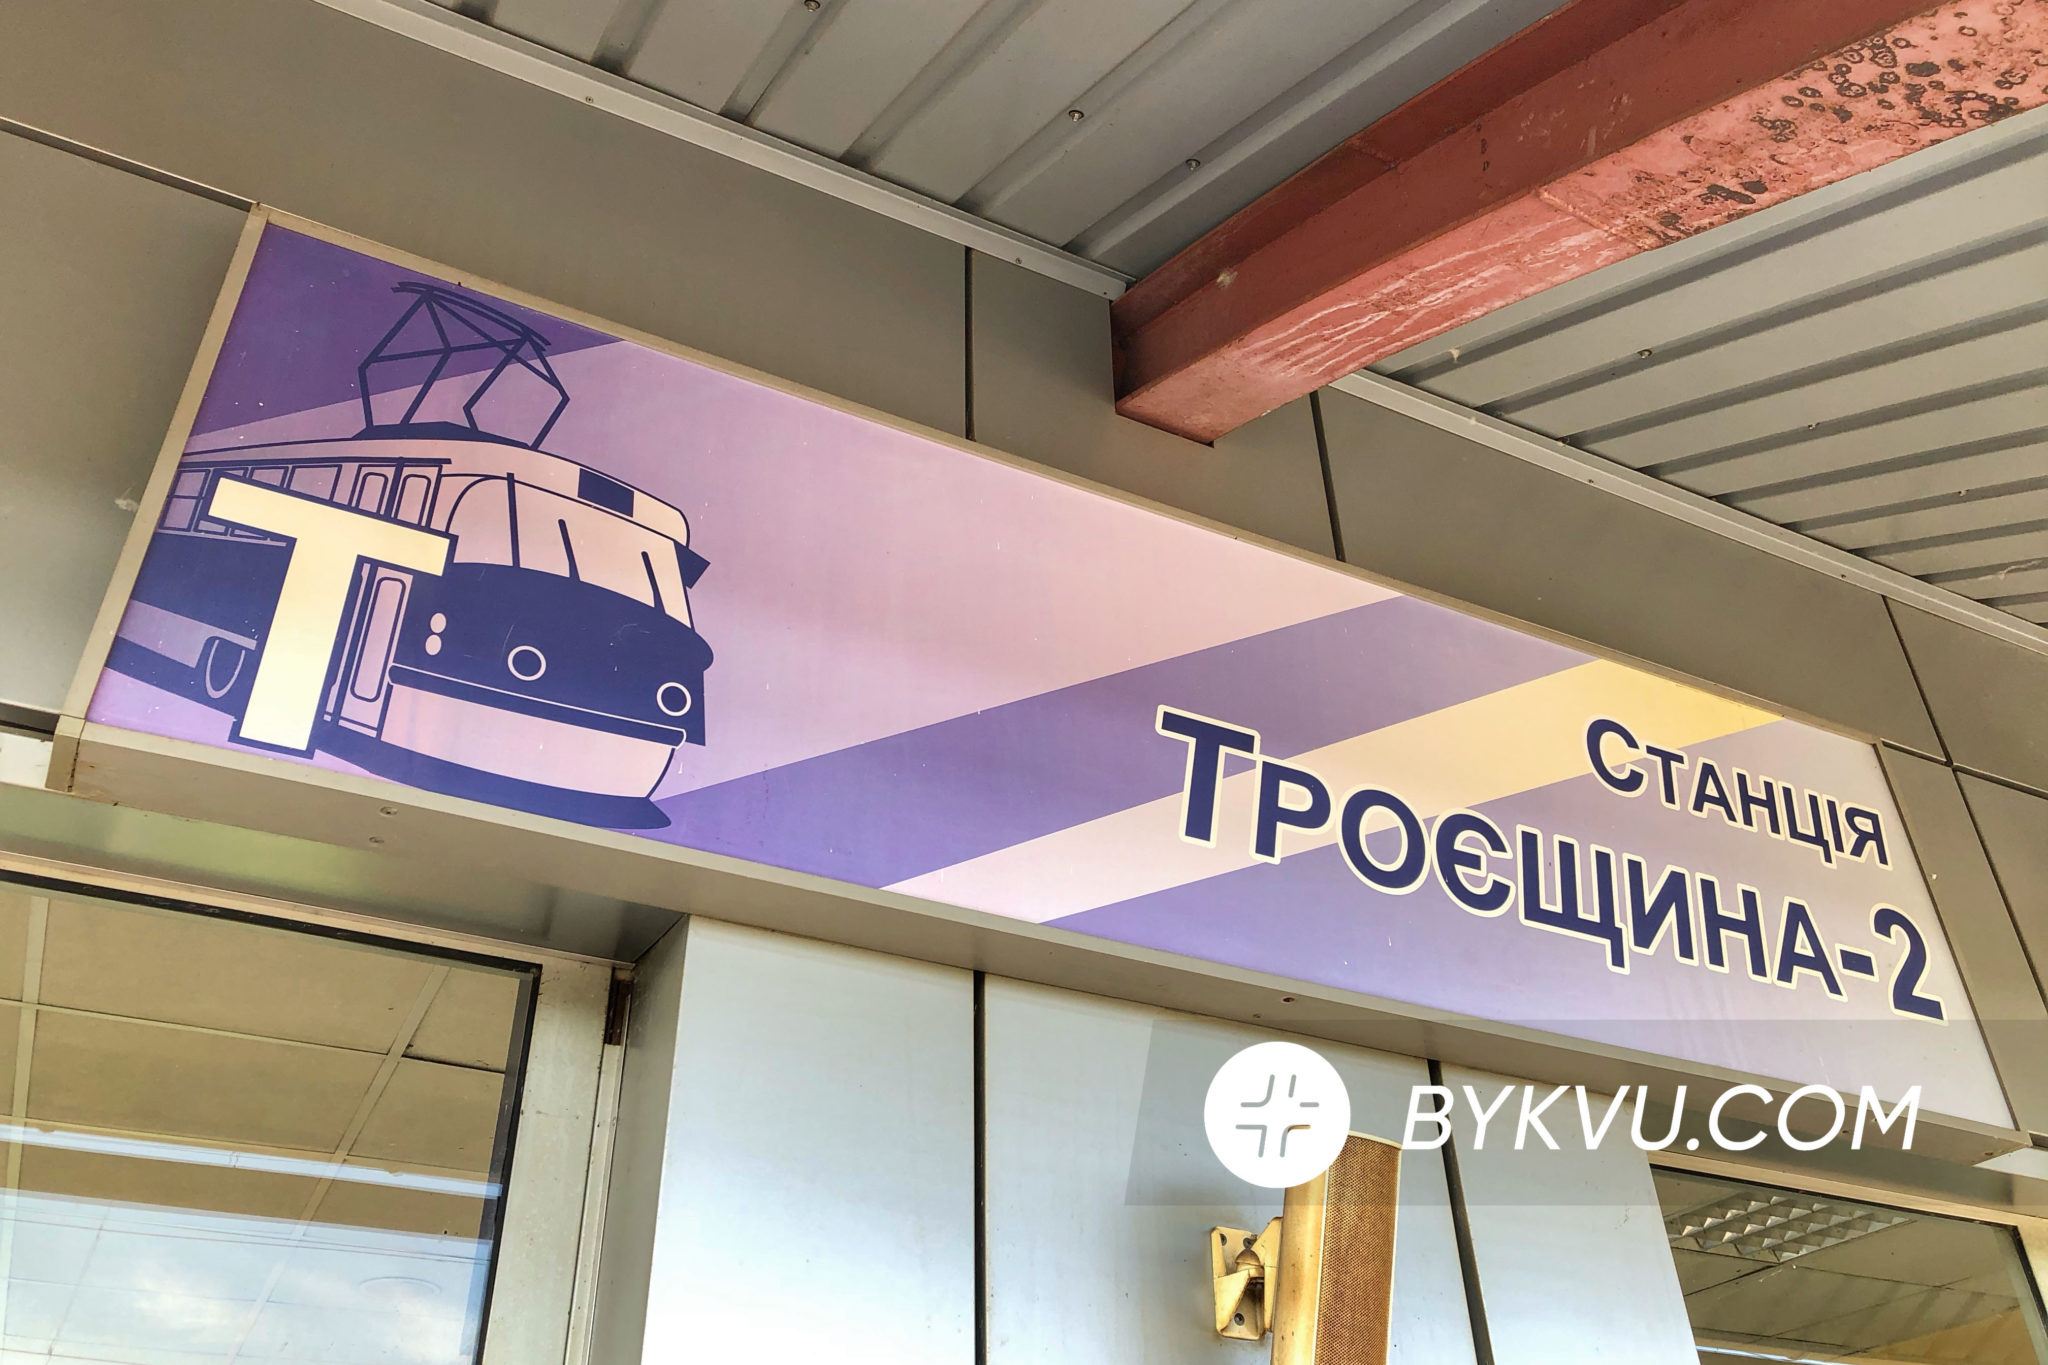 электричка_Киев станция_троещина